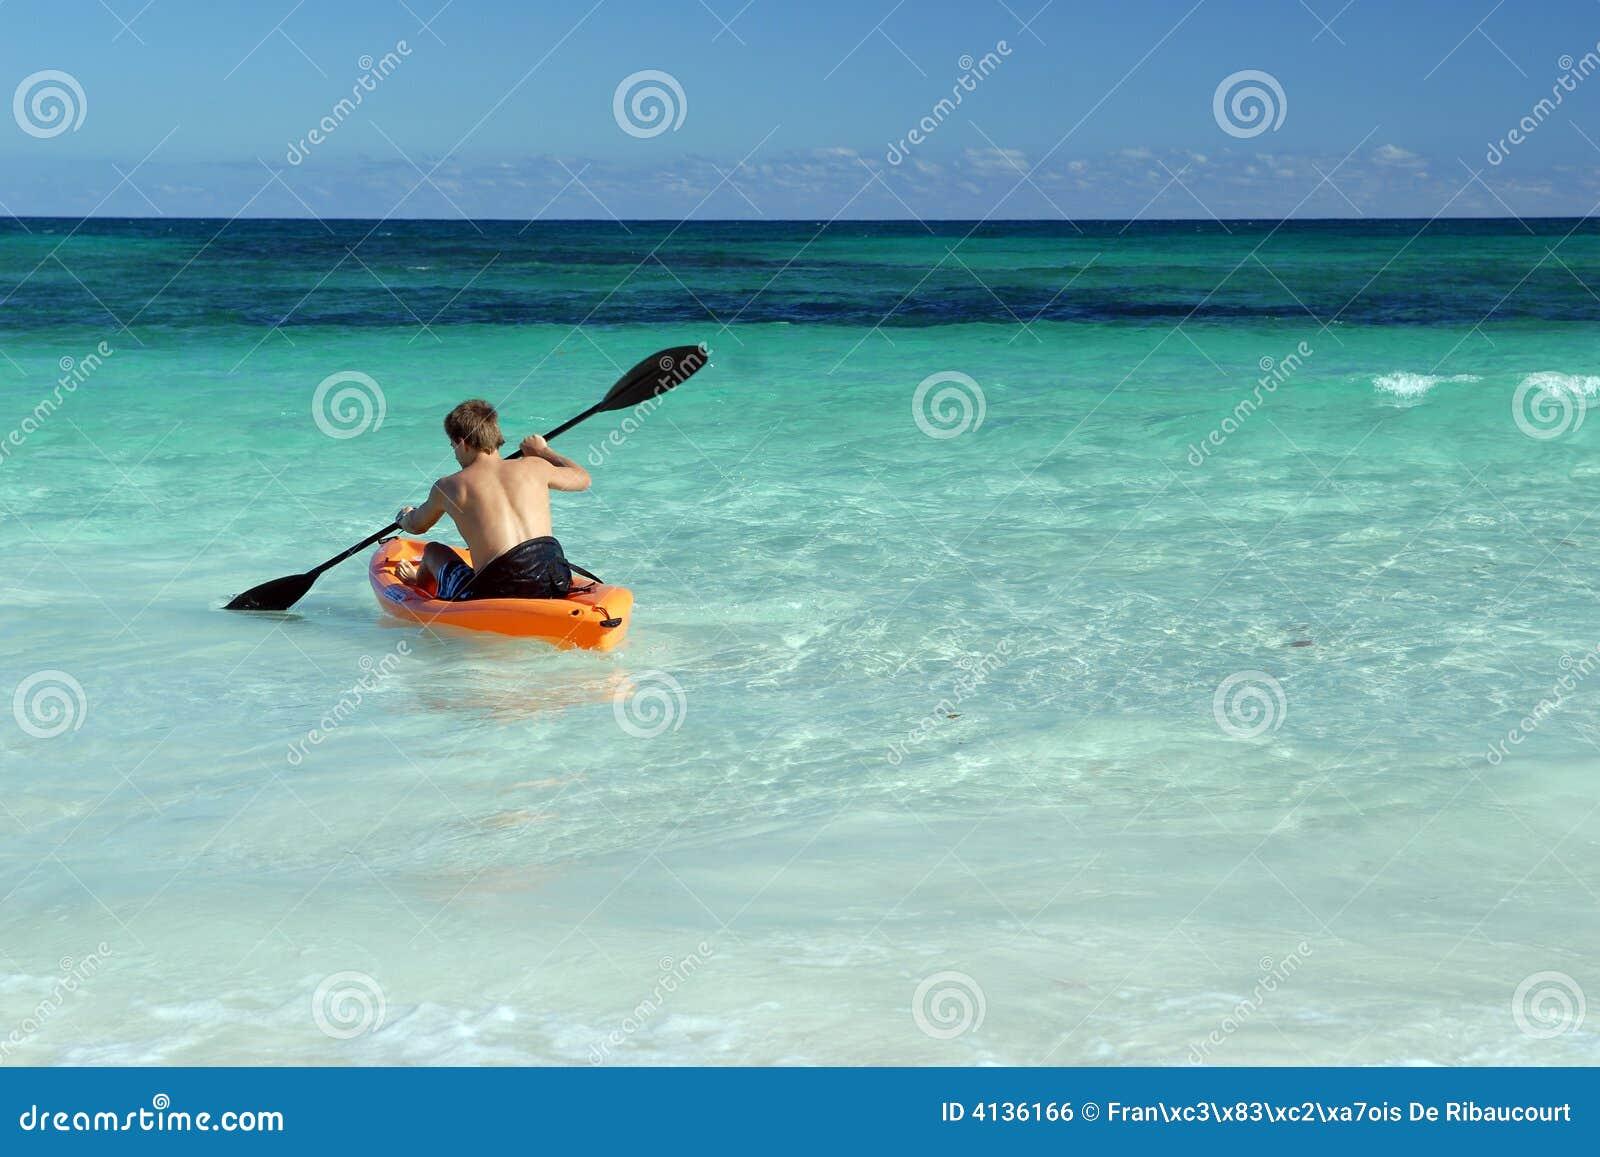 Canoeist de solo que rema no mar